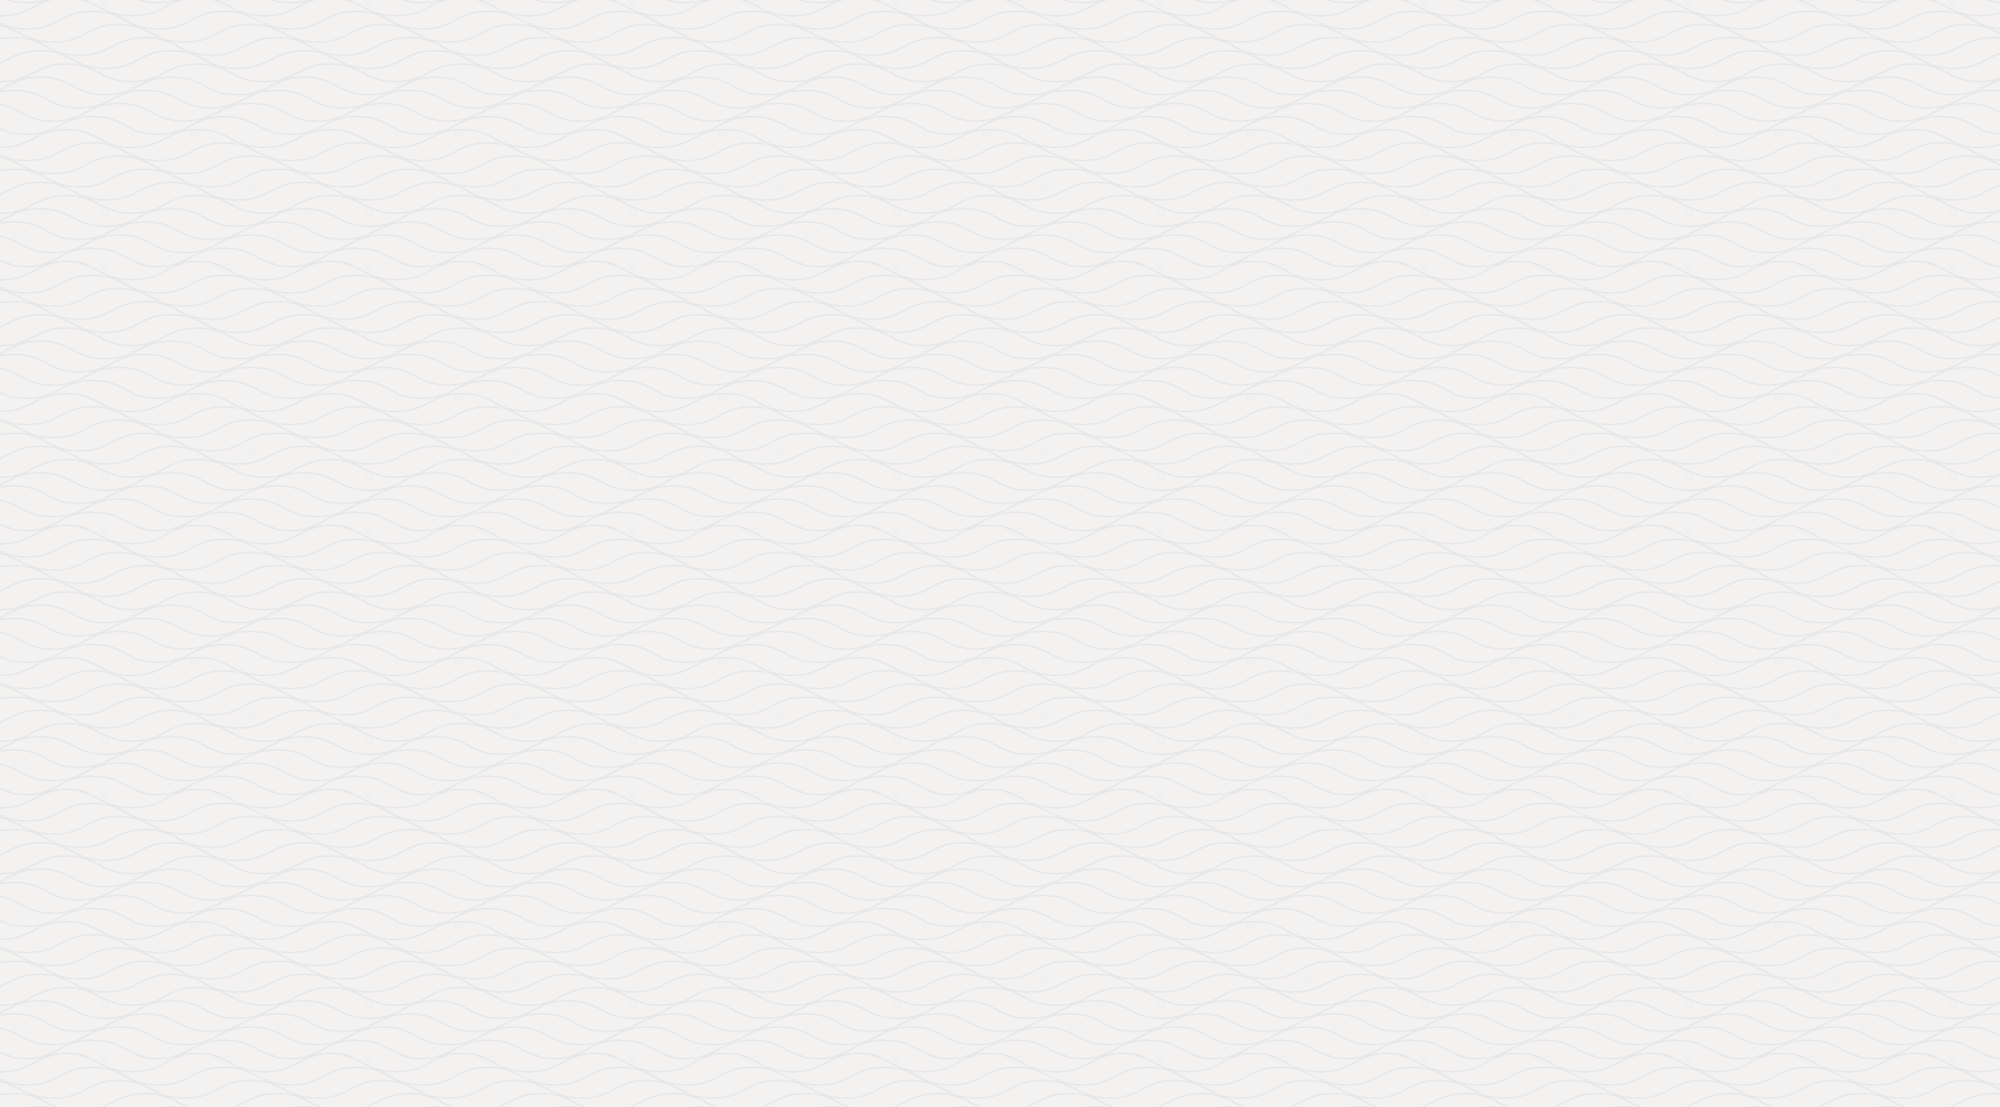 wavy background pattern